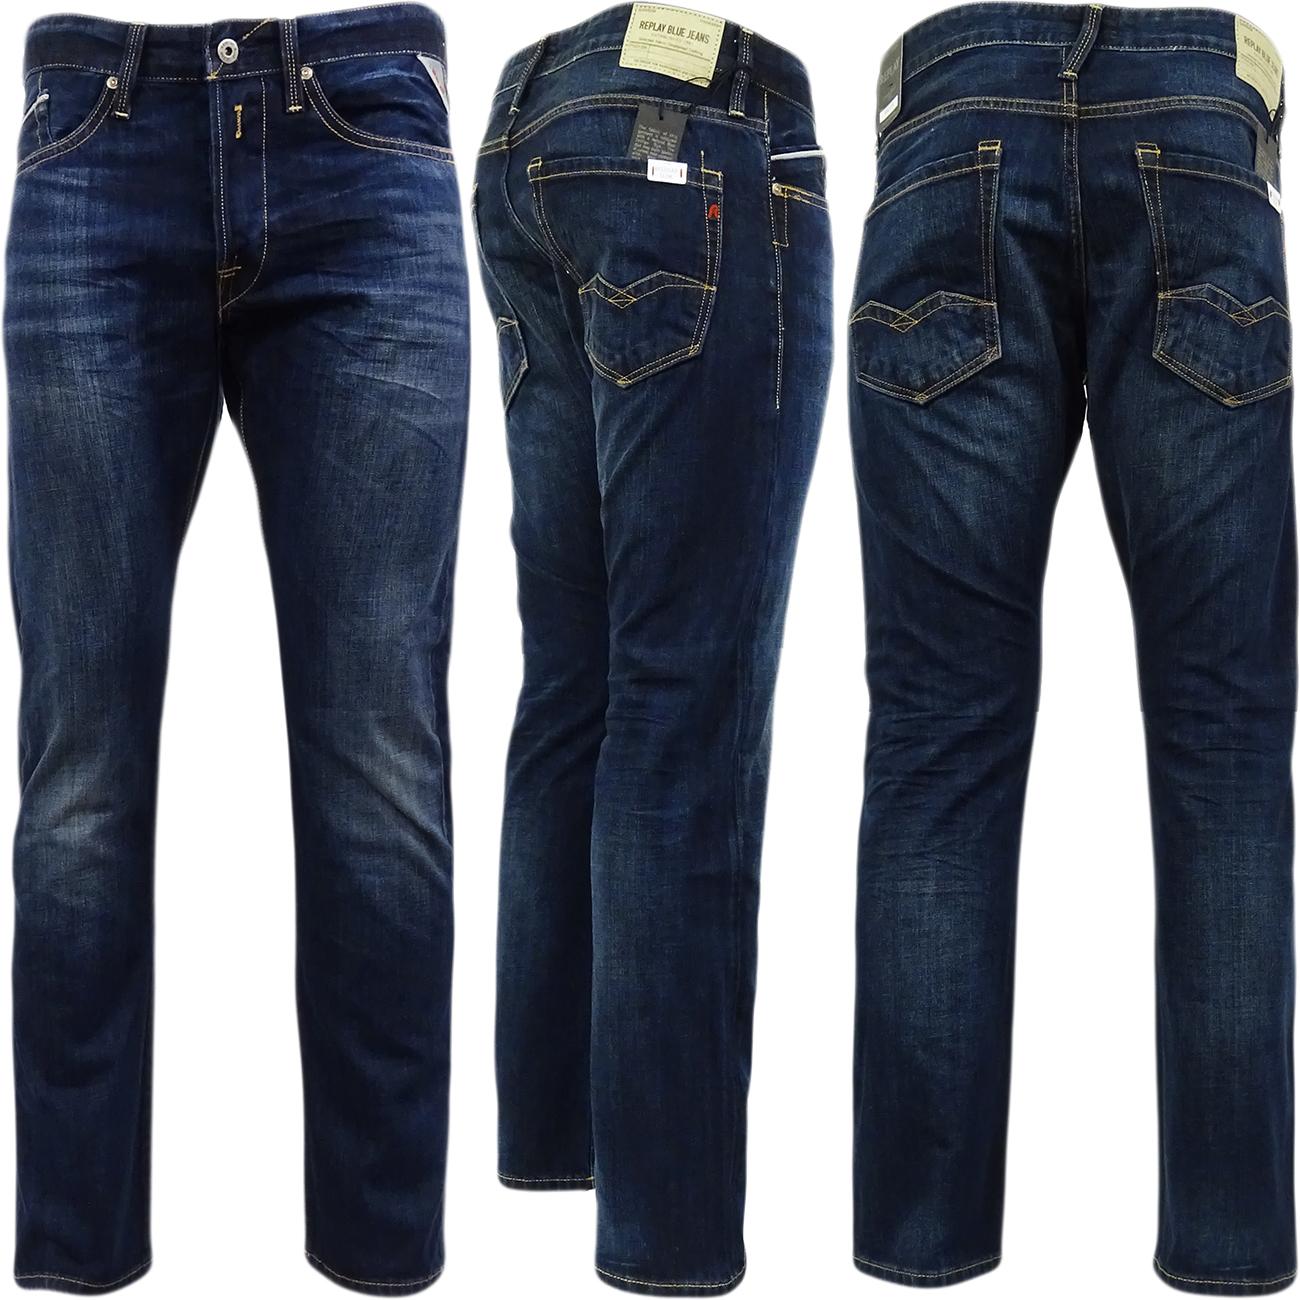 Blue Denim Mens Jeans regular Jean Waitom Replay Dark Fit Slim vcFqSxa4wF